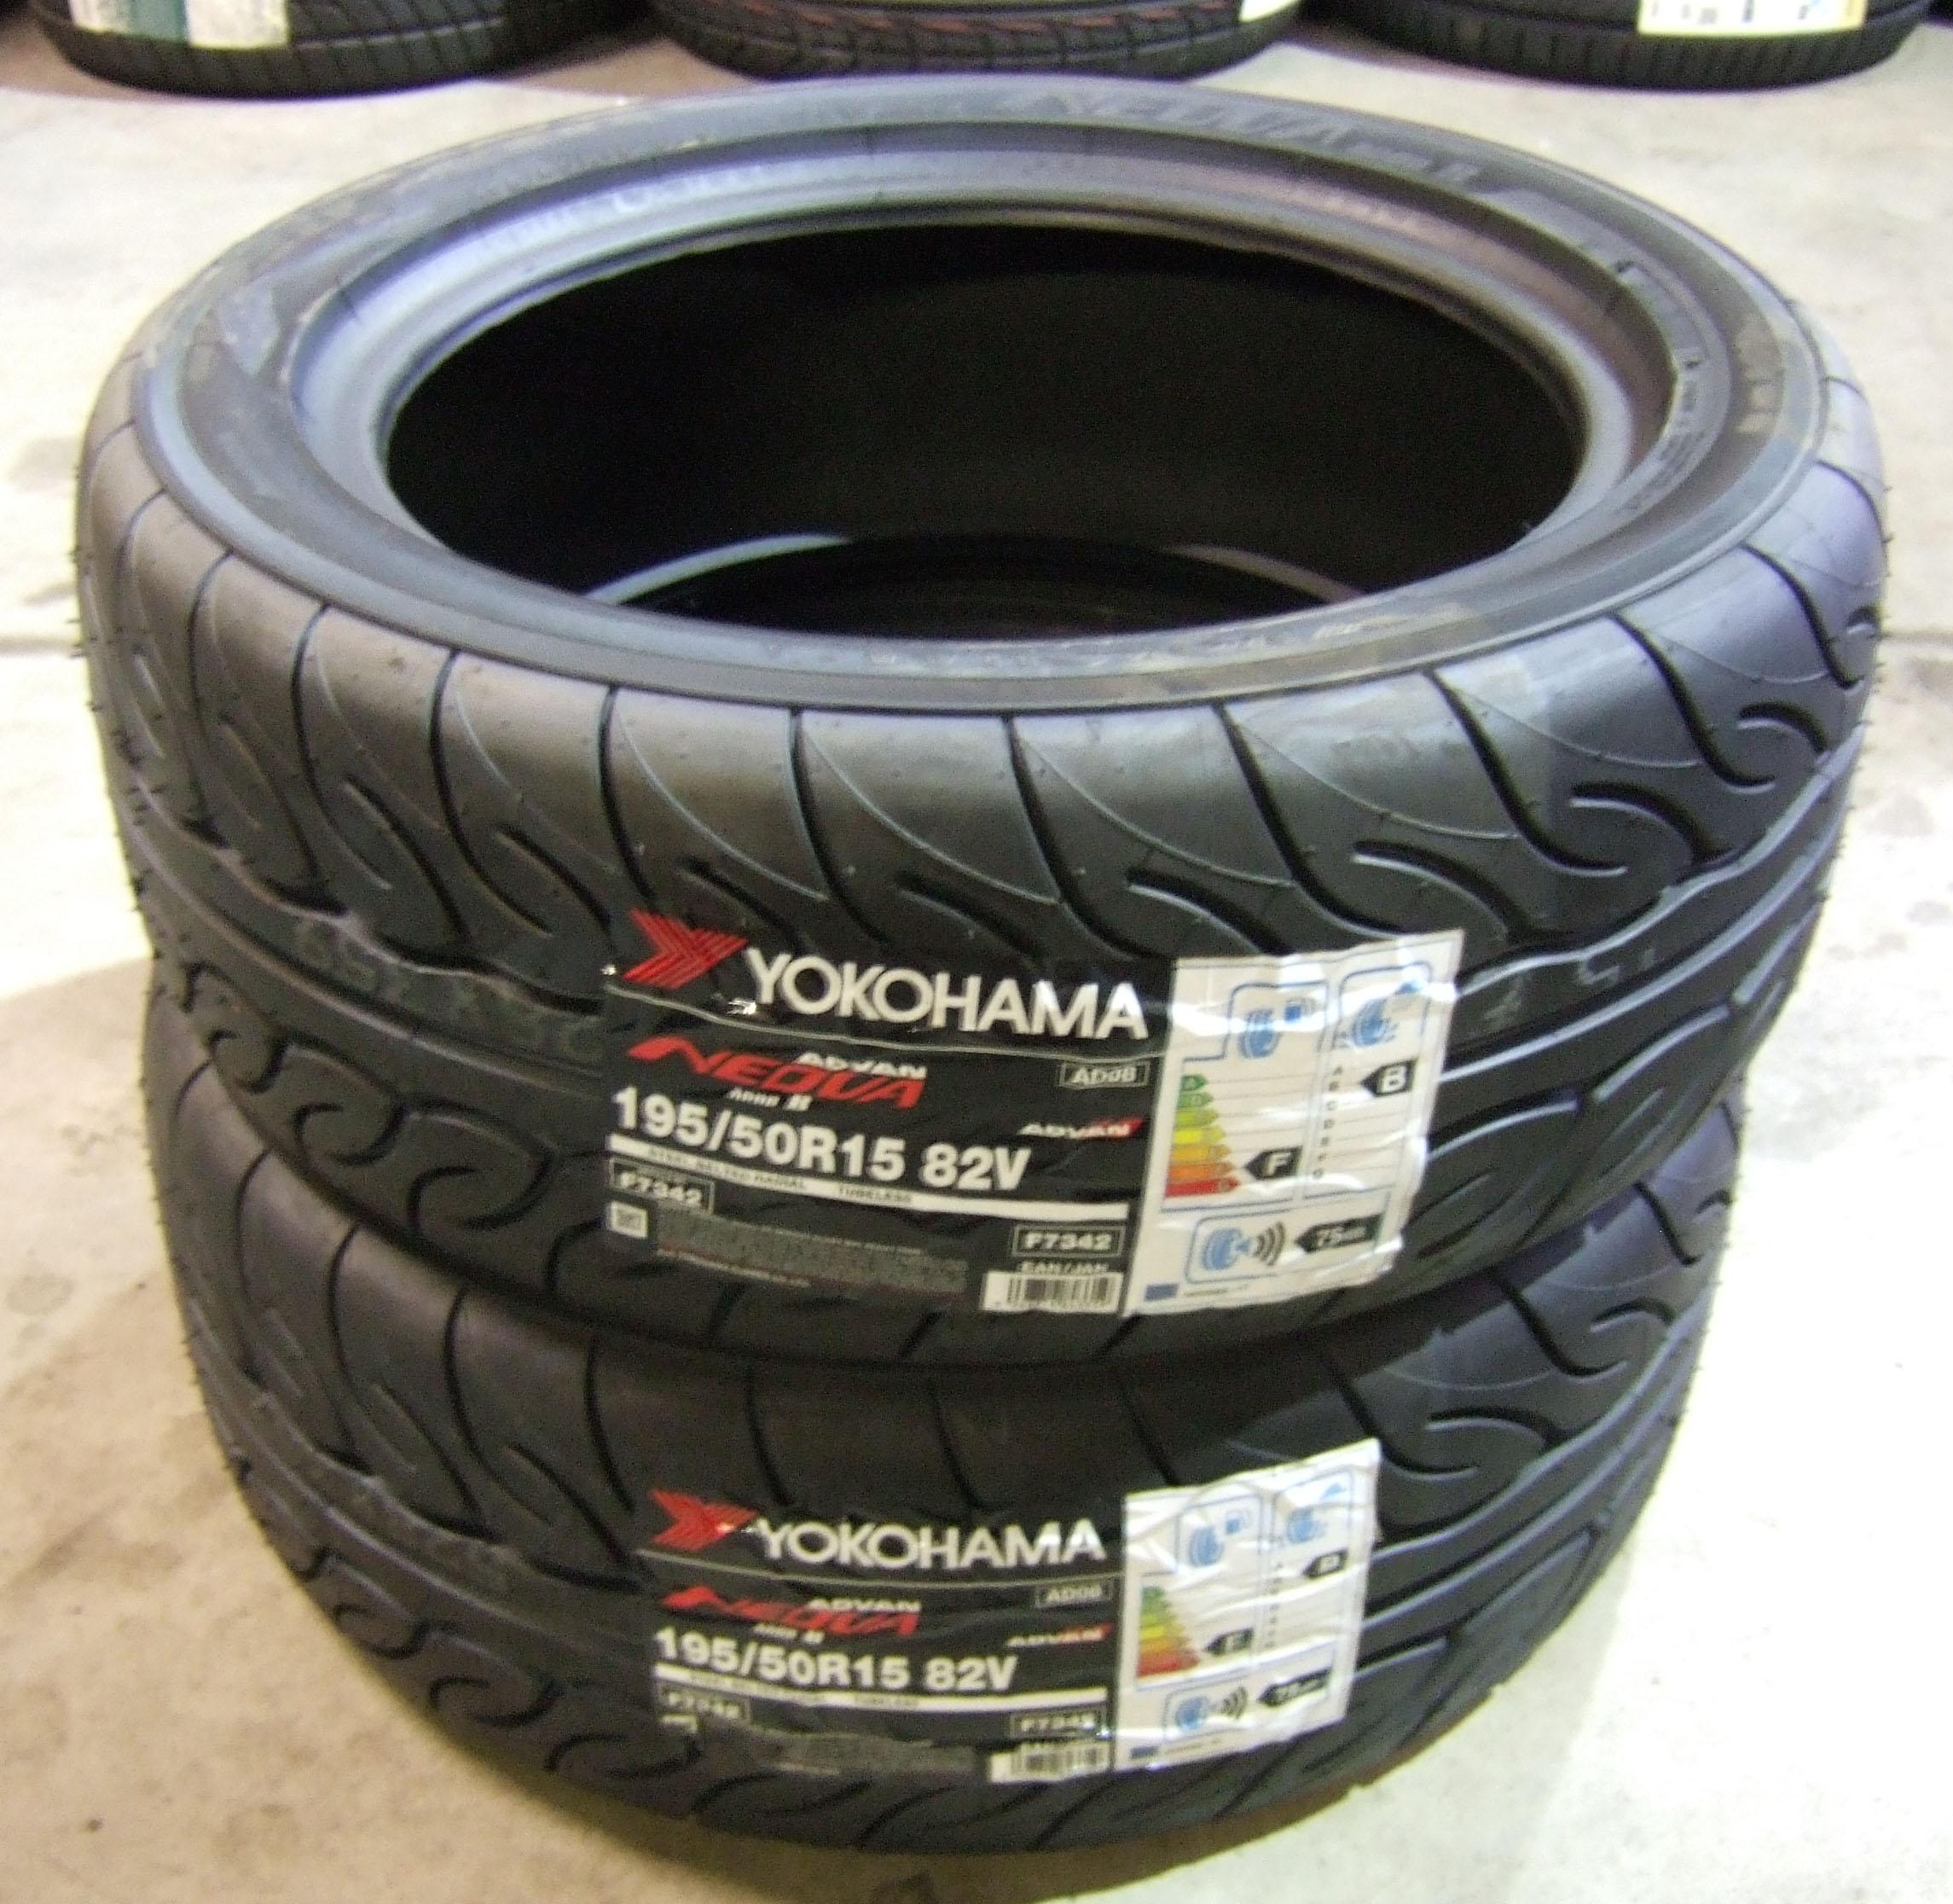 195 50 15 yokohama ad08r road legal track day tyres 1955015 82v 195 50 15 x2 ebay. Black Bedroom Furniture Sets. Home Design Ideas